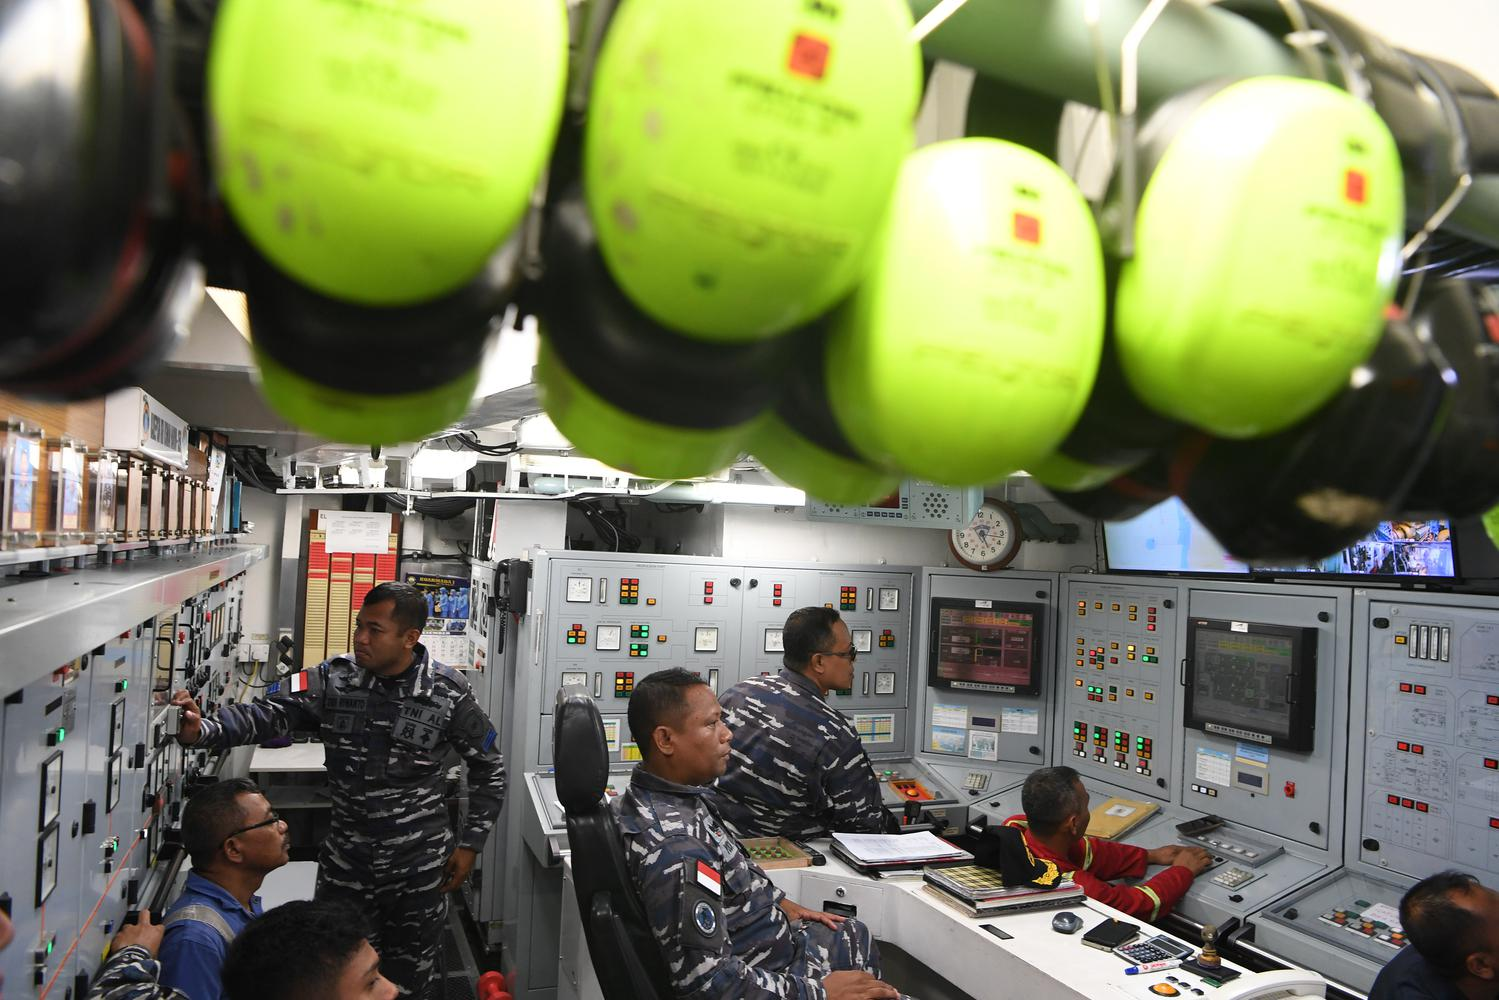 Kadepsin KRI Usman Harun-359 Mayor Laut (T) Yodi Wahyudi (tengah) mengamati monitor di ruang mesin KRI KRI Usman Harun-359 ketika bertolak dari perairan Kupang menuju Dili, Timor Leste di perairan Kupang, NTT, Selasa (10/12/2019). KRI Usman Harun bertolak dari dermaga Mako Lantamal VII Kupang pada Selasa (10/12) kemarin dan menempuh pelayaran selama 13 jam lebih agar bisa tiba di Timor Leste.